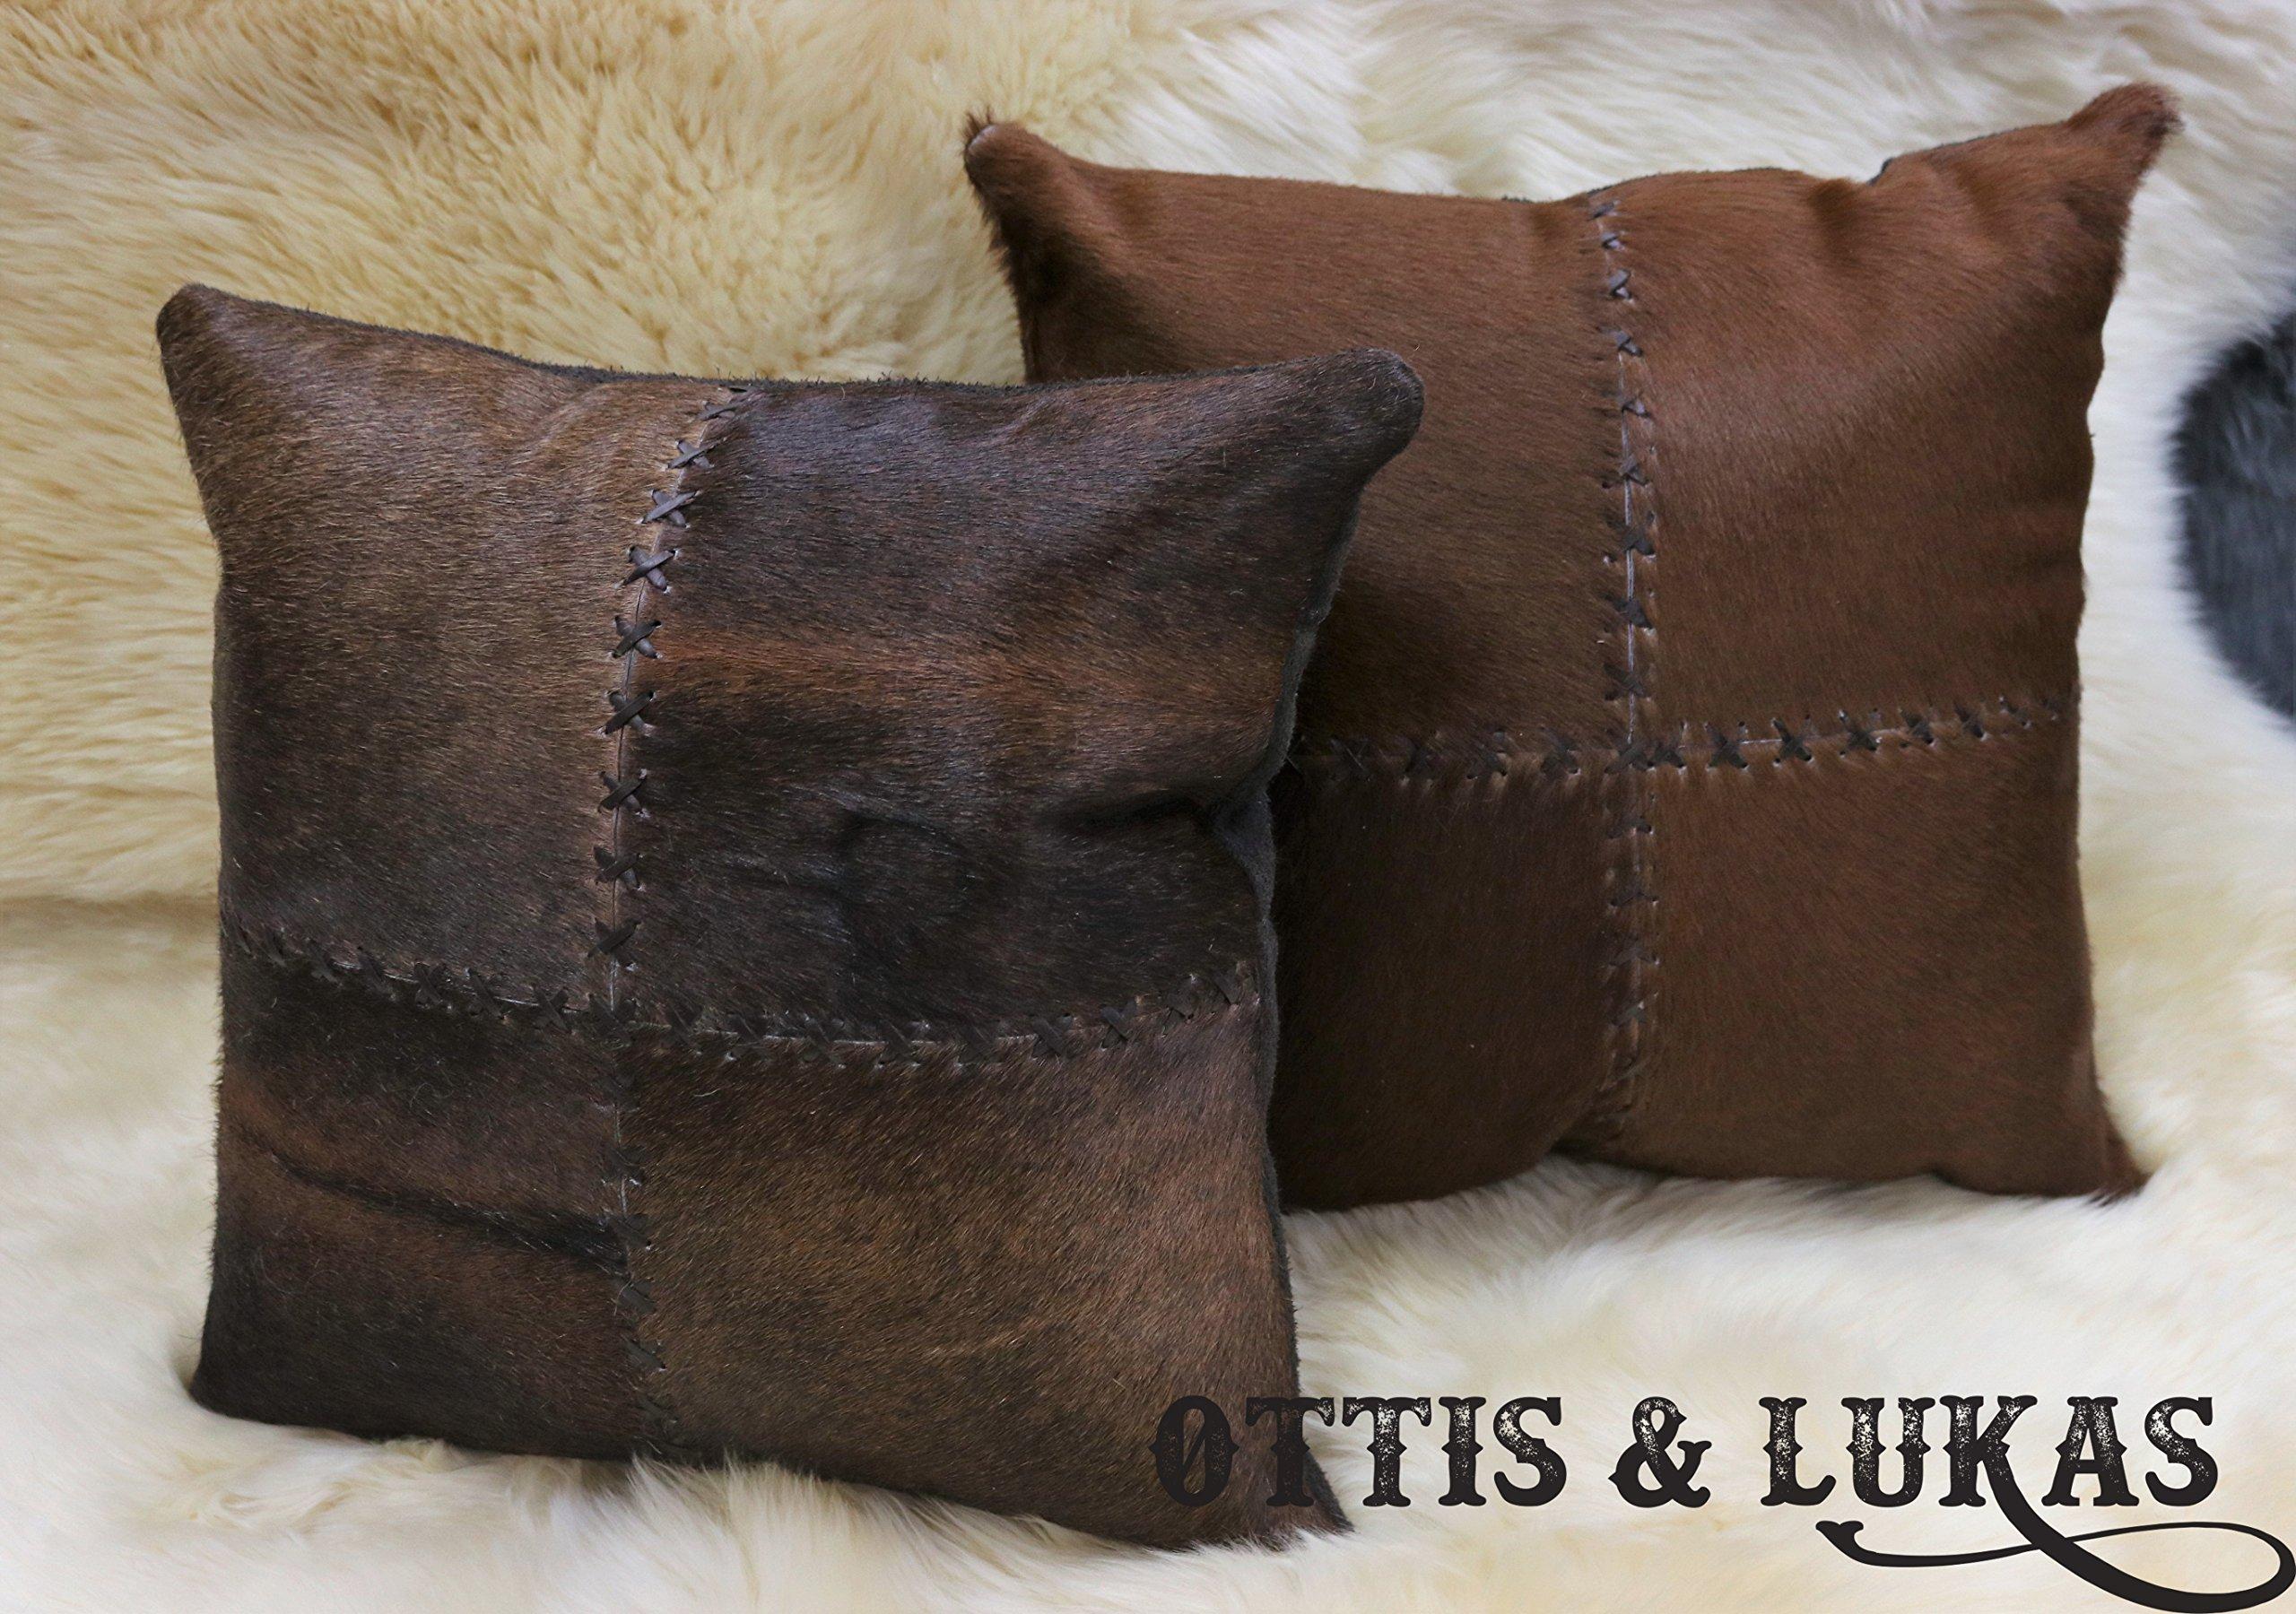 Set Genuine Cowhide Pillows 15'' x 15'' Genuine Animal Skin - Polyester Fiberfill Include